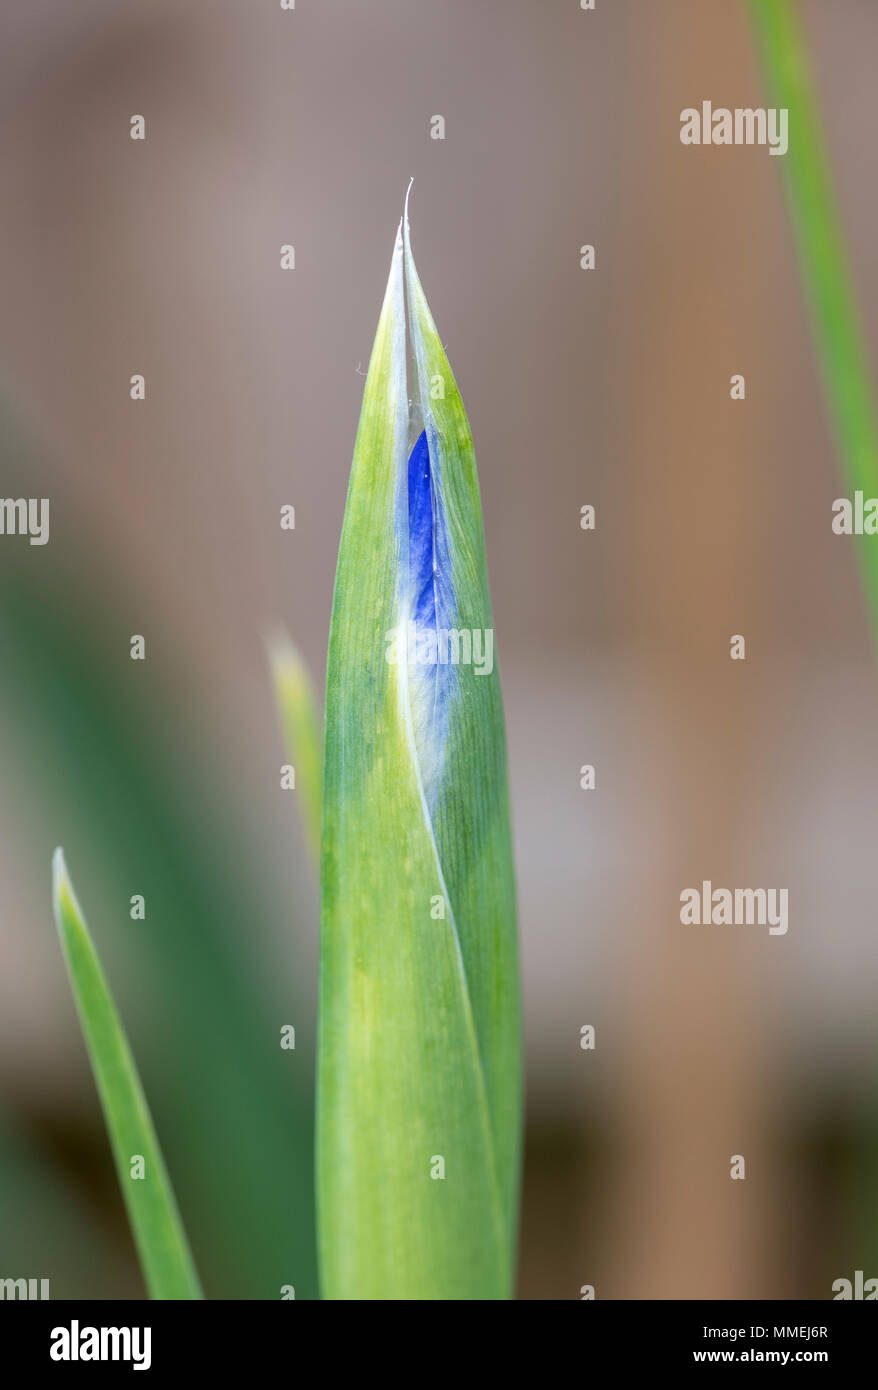 Fleur De Lotus Dijon de bud stock photos & de bud stock images - alamy